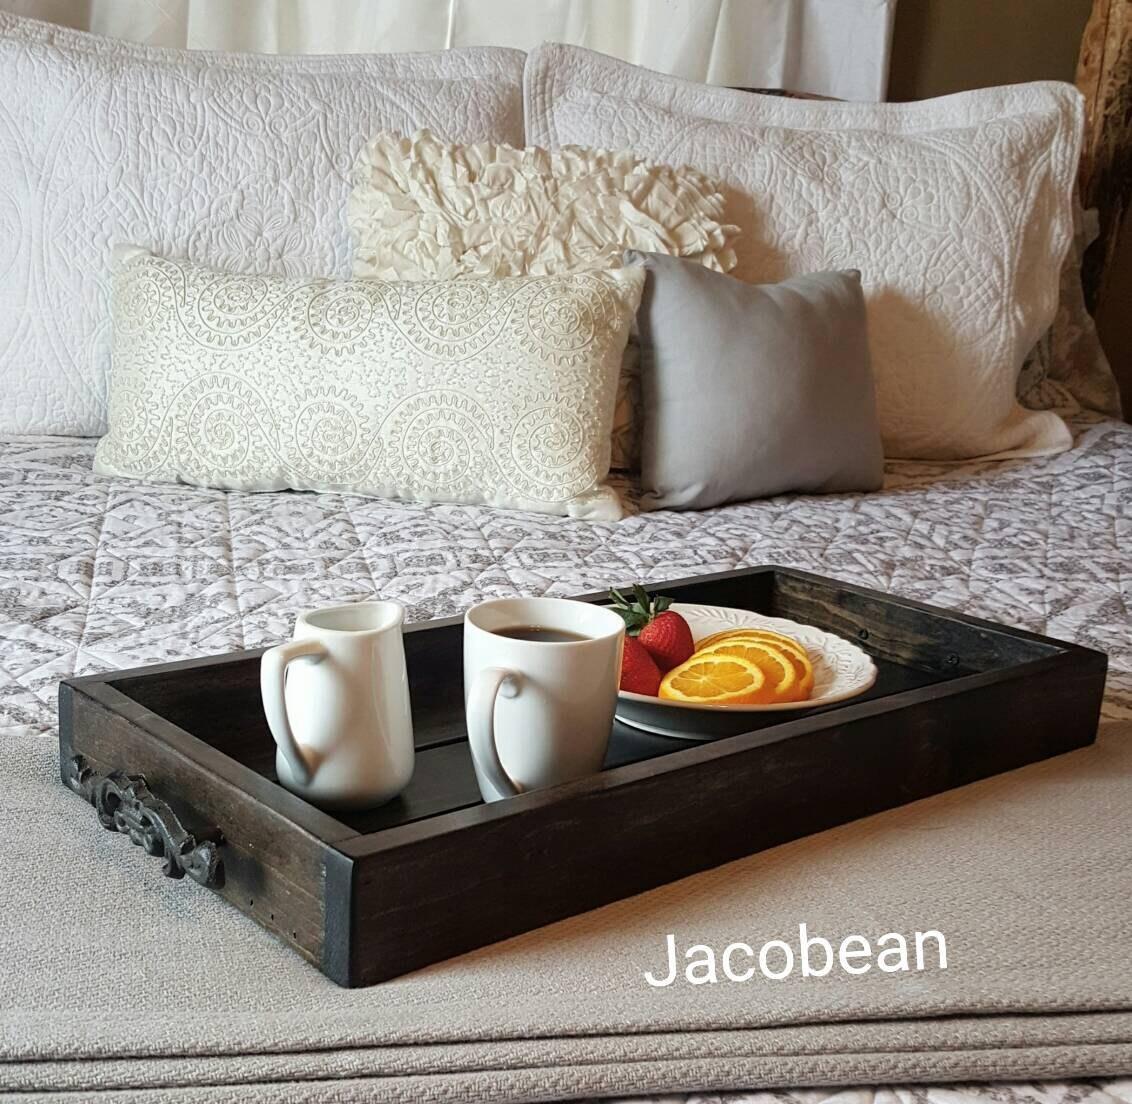 ... Decorative Tray   Coffee Table Tray   Casserole Tray. Gallery Photo  Gallery Photo Gallery Photo ...